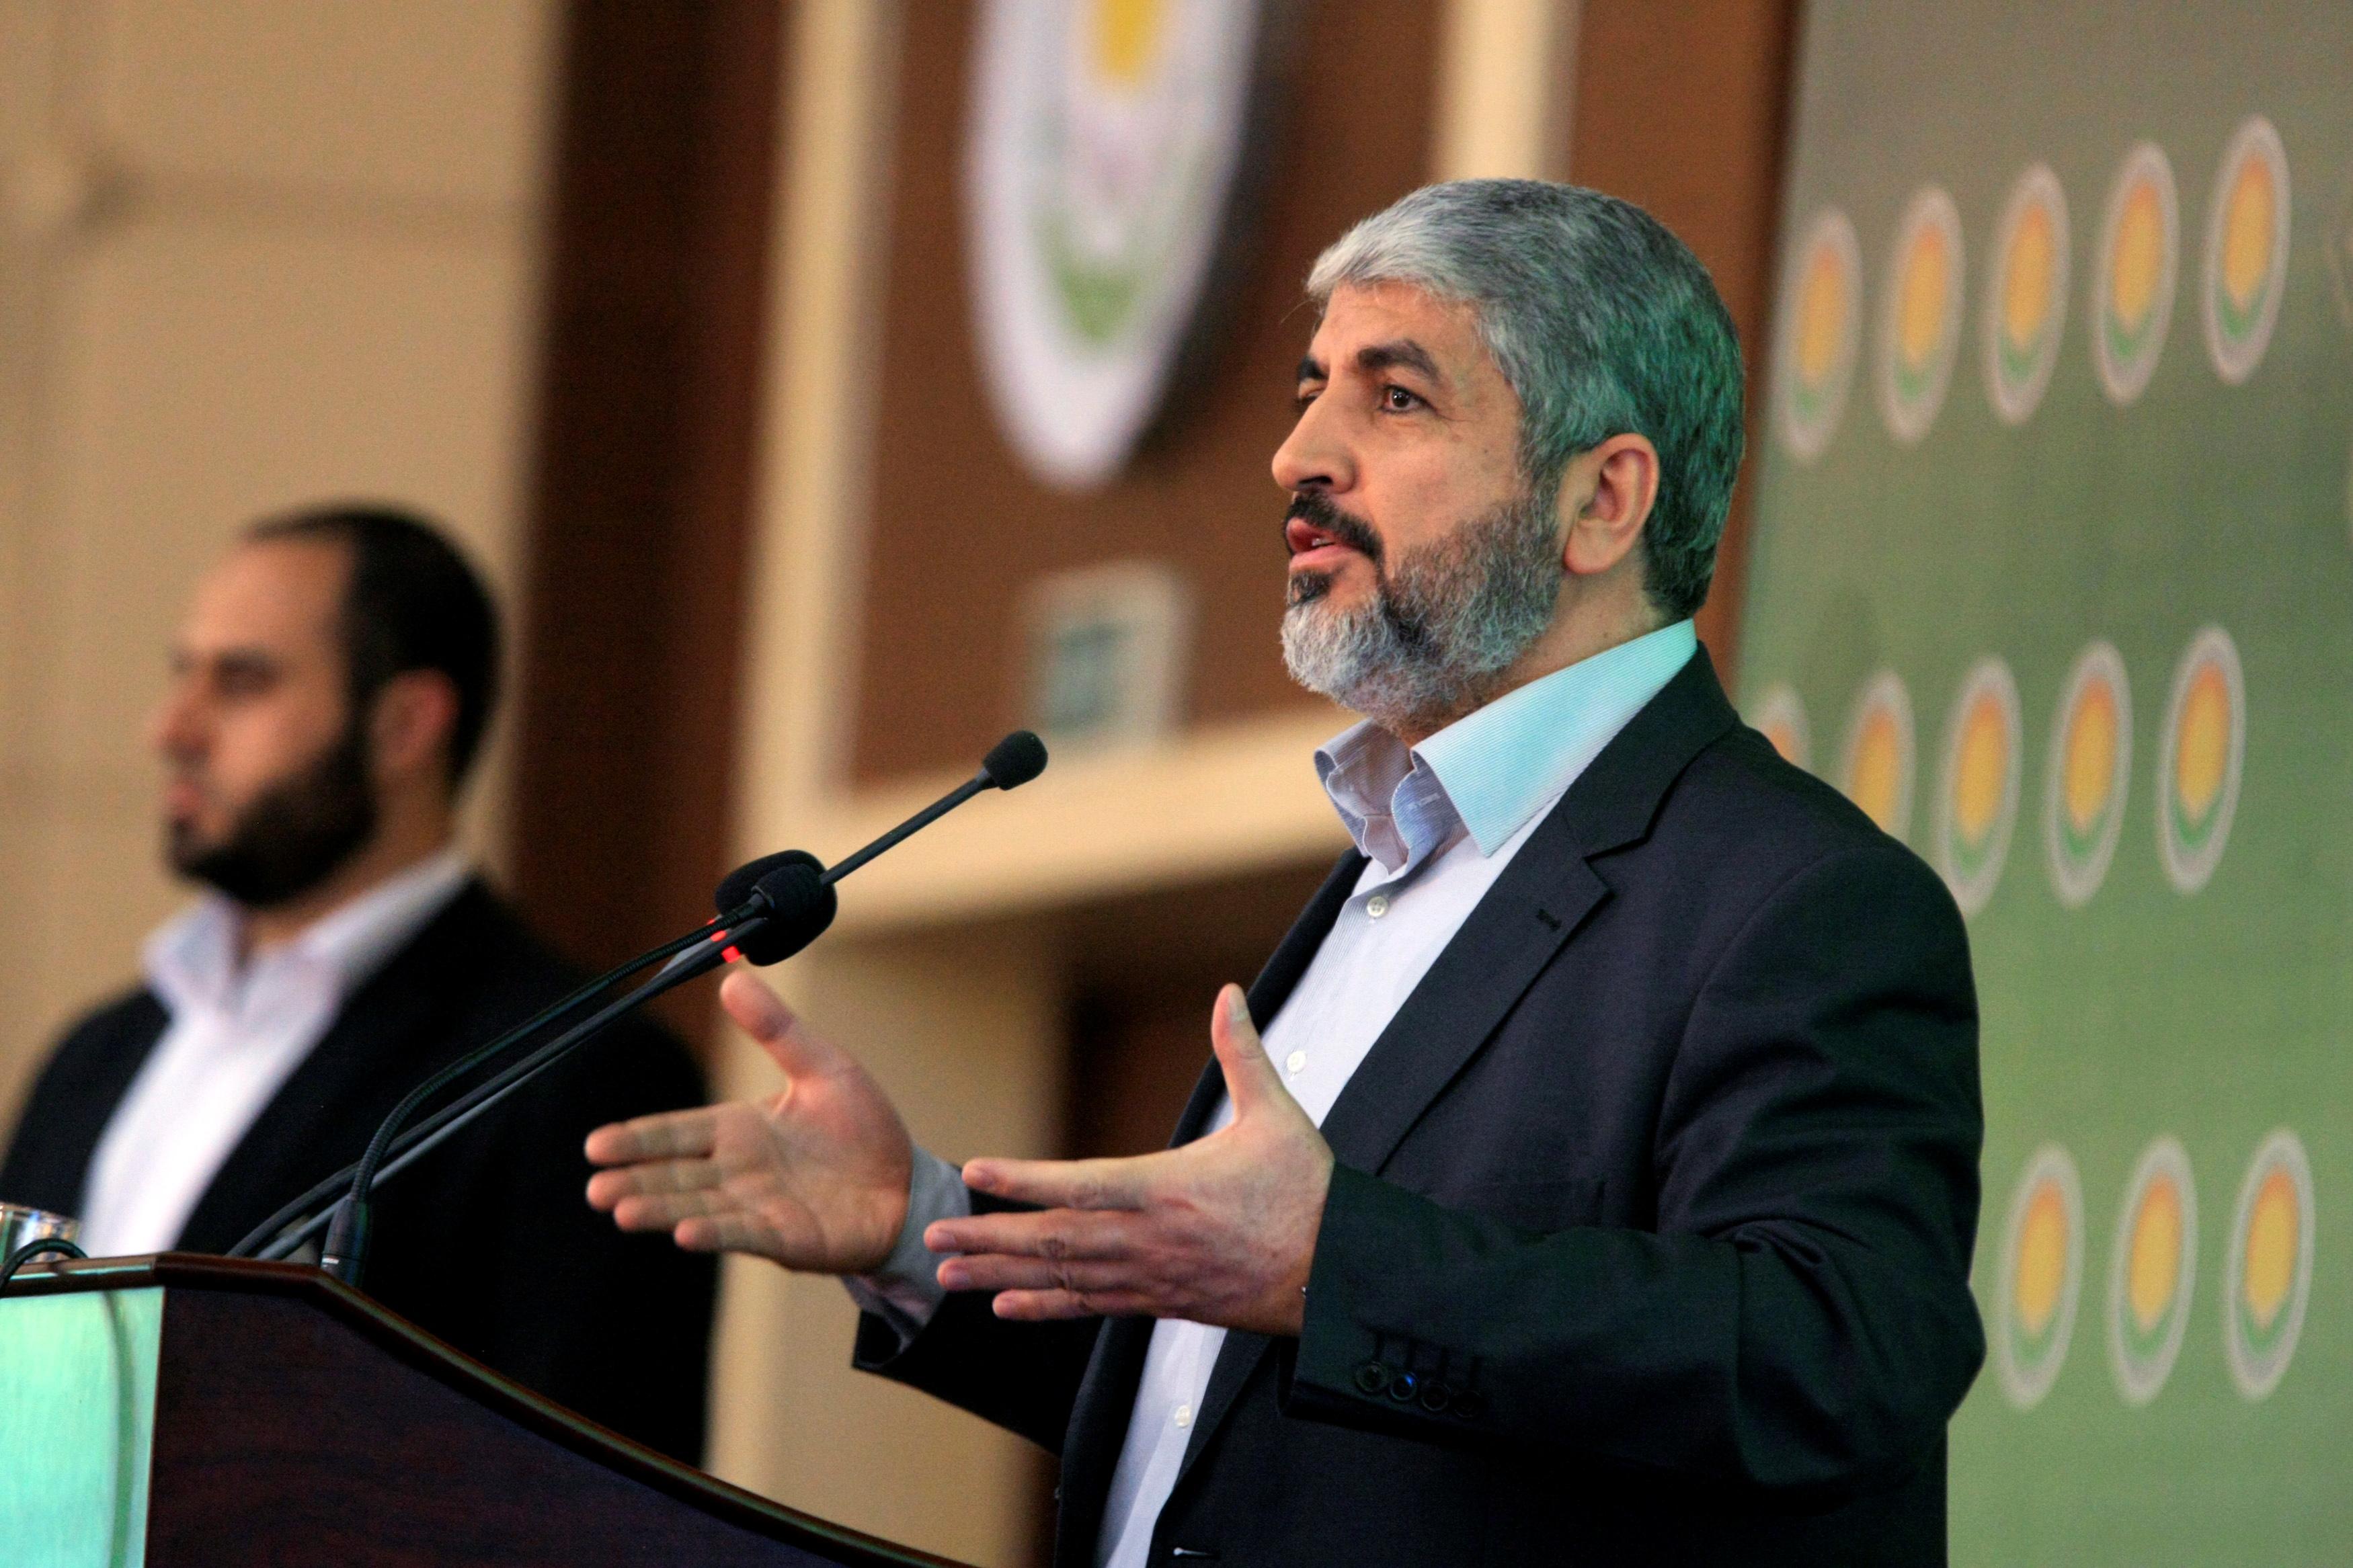 Hamas Leader Khaled Meshaal addresses the 8th General Conference of Sudanese Islamic Movement in Khartoum November 15, 2012. REUTERS/Mohamed Nureldin Abdallah/File Photo